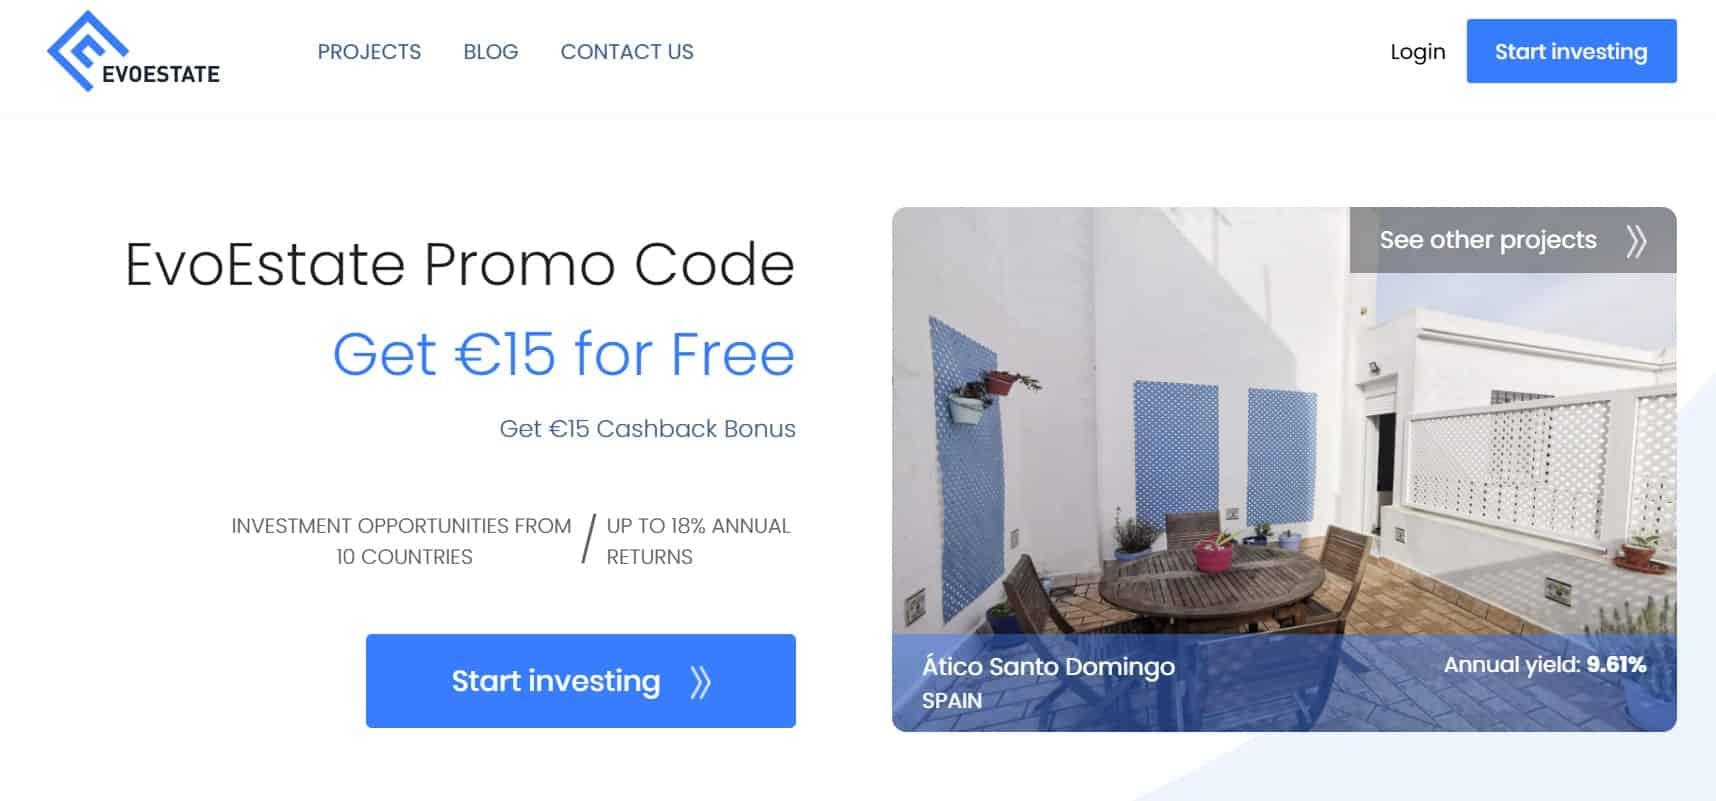 EvoEstate promo code